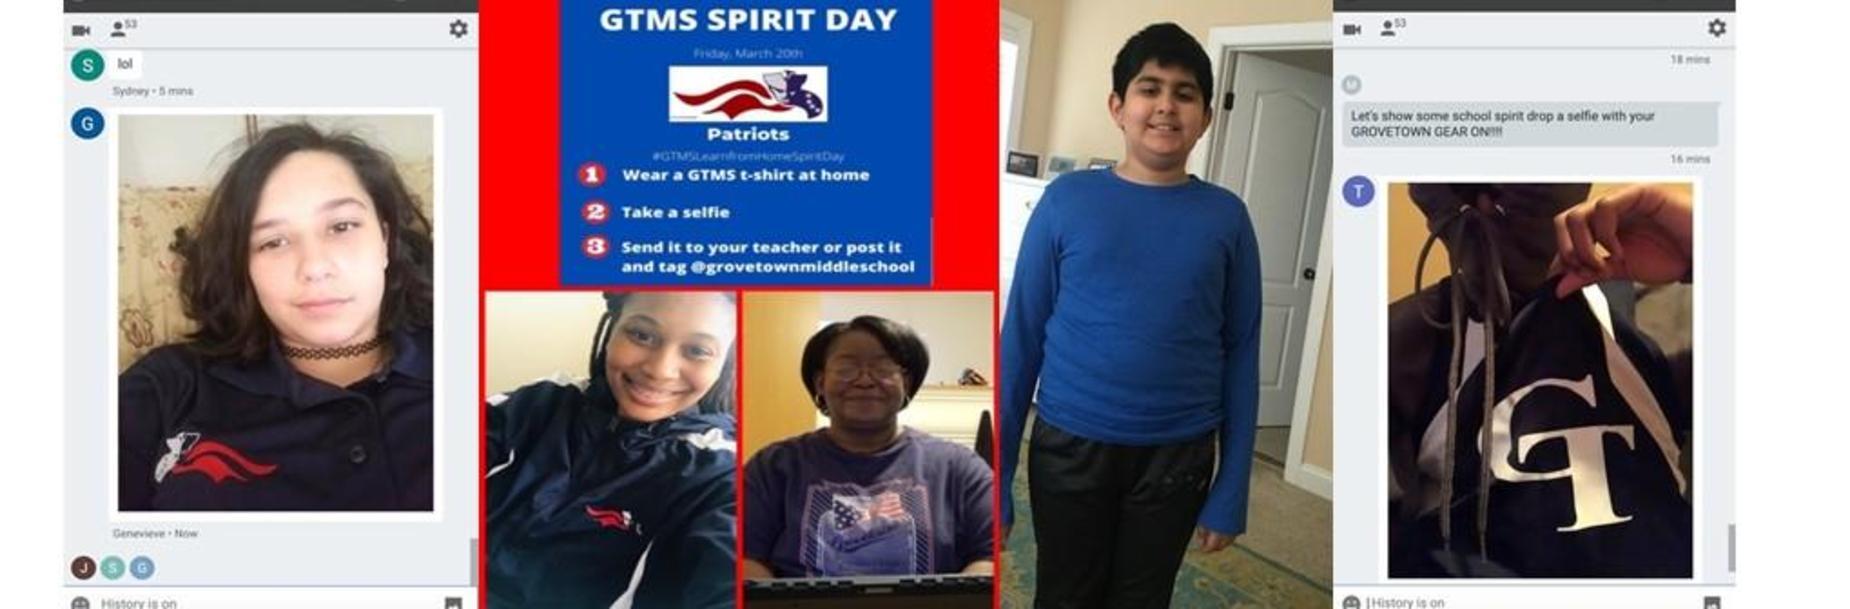 GTMS Spirit